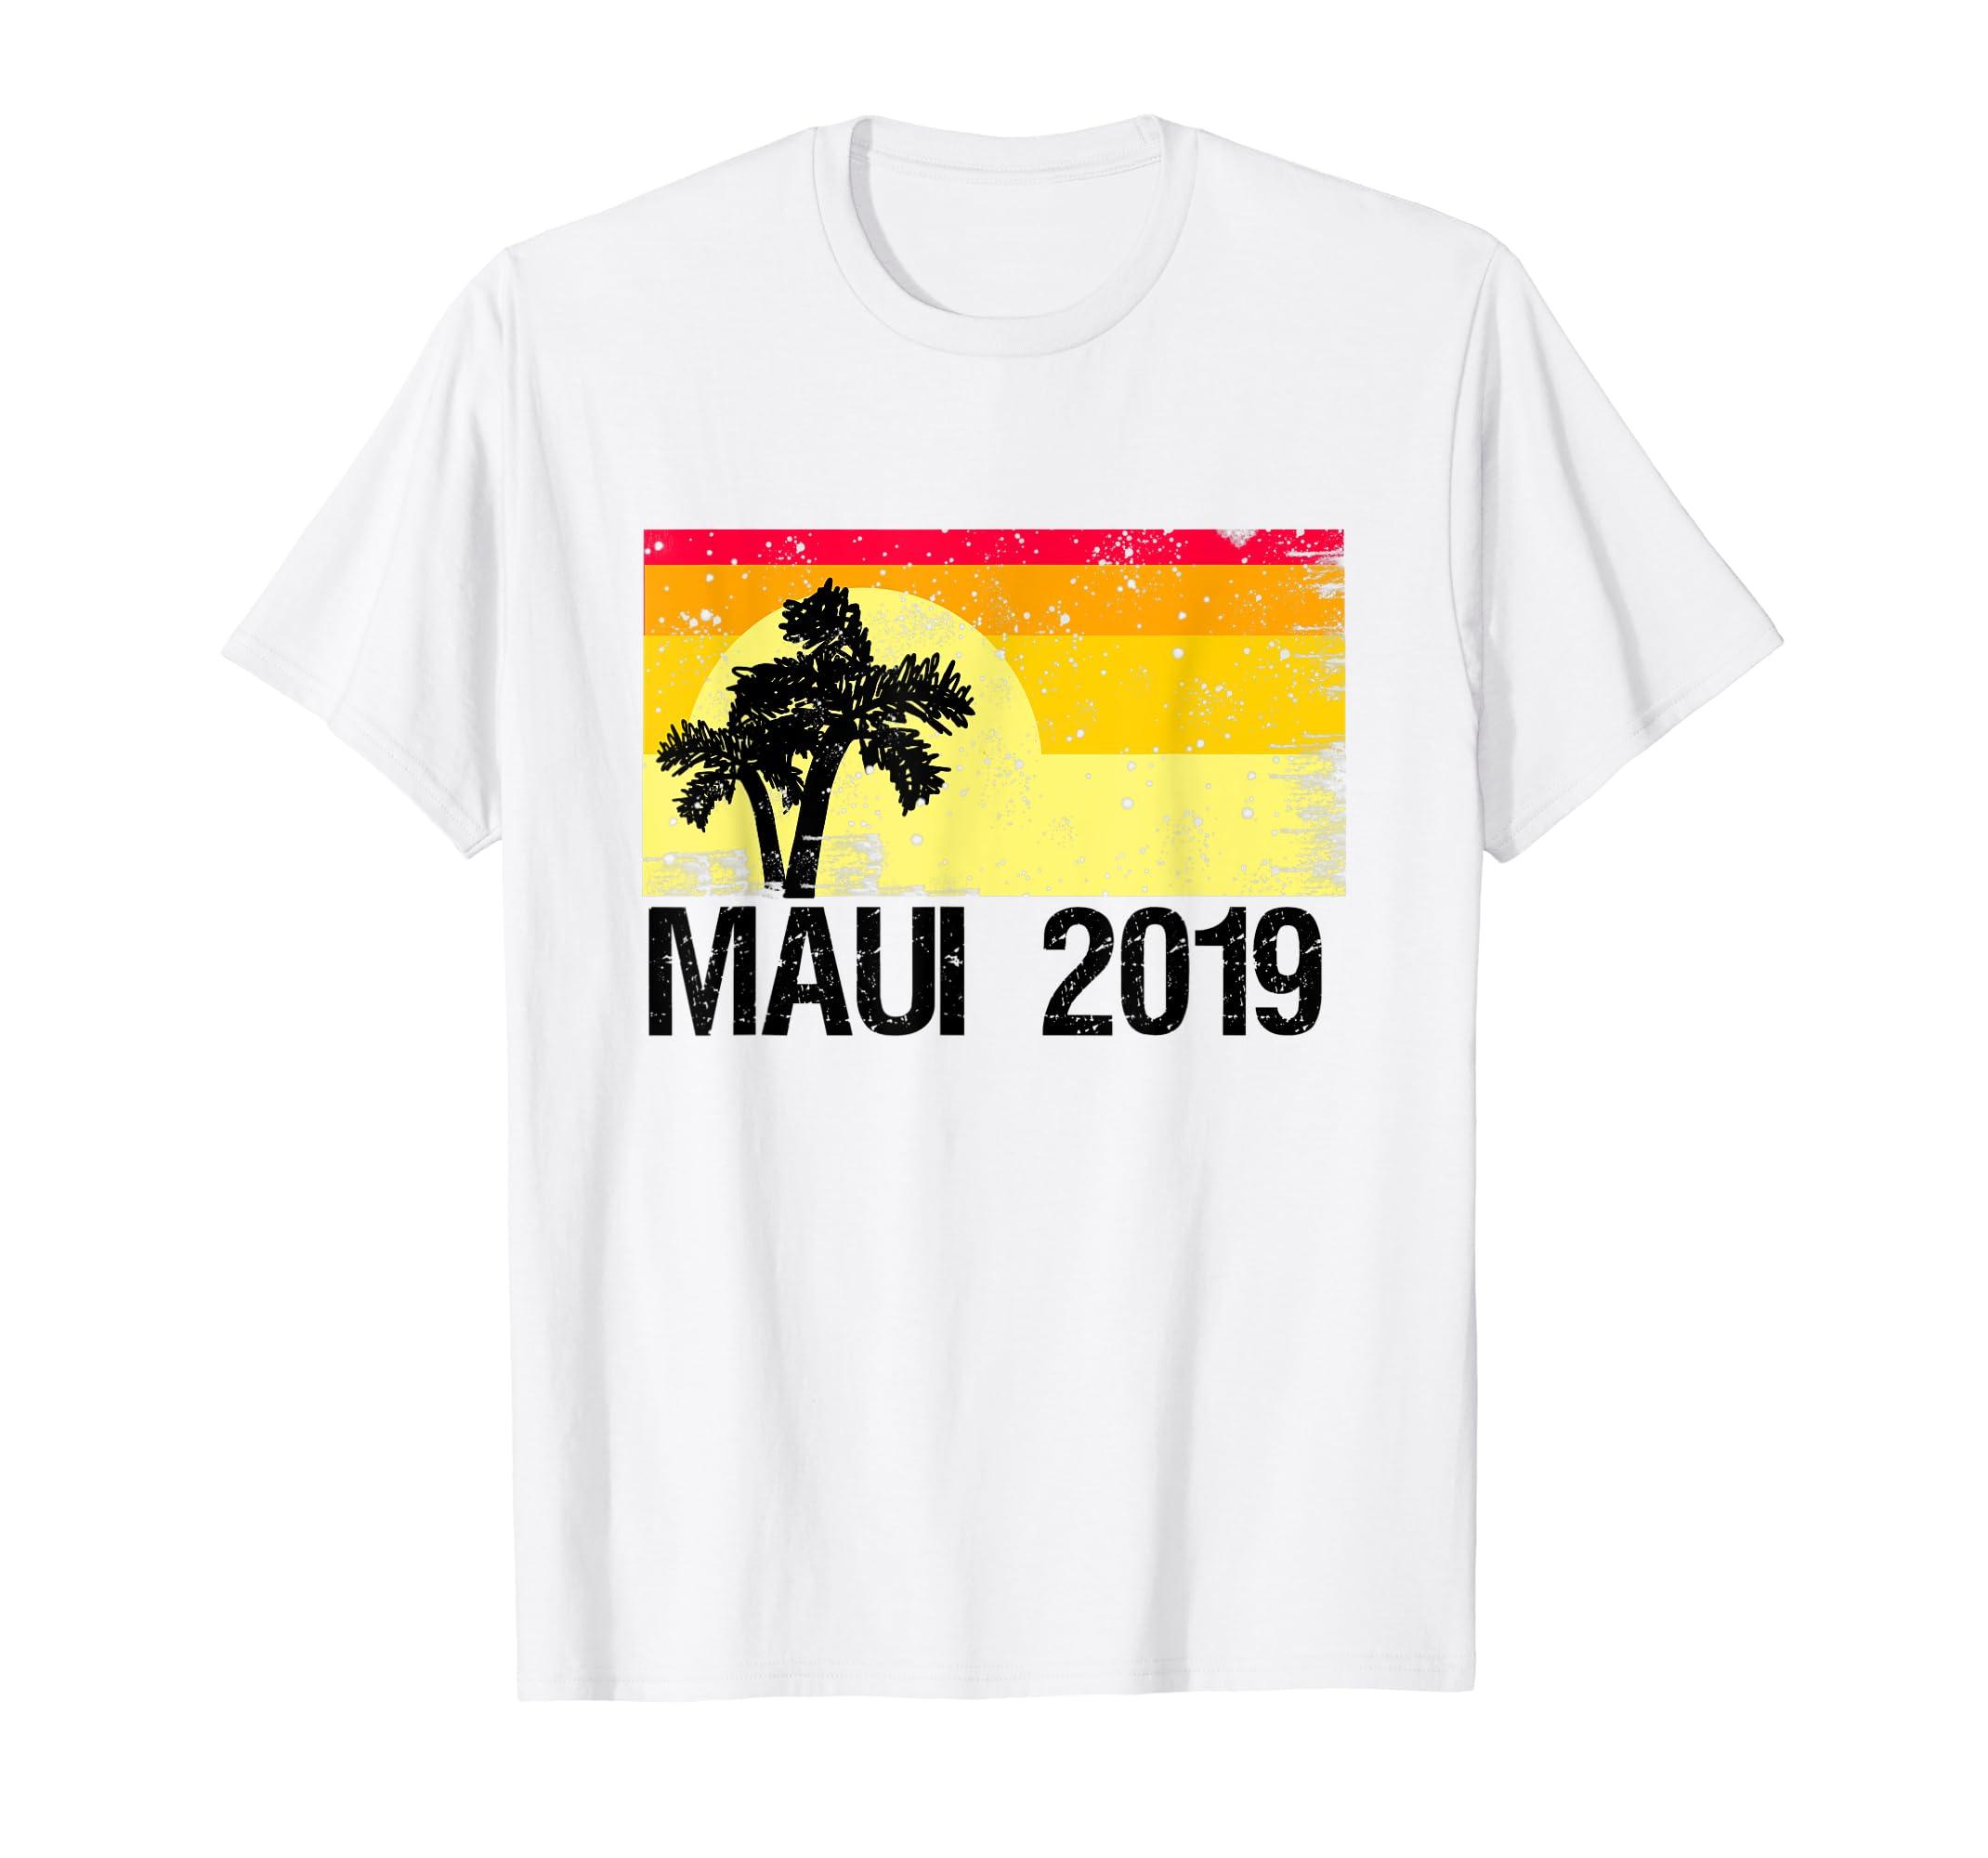 bd52d39beef Amazon.com  Maui 2019 Souvenir Vintage Distressed Hawaiian T-Shirt  Clothing